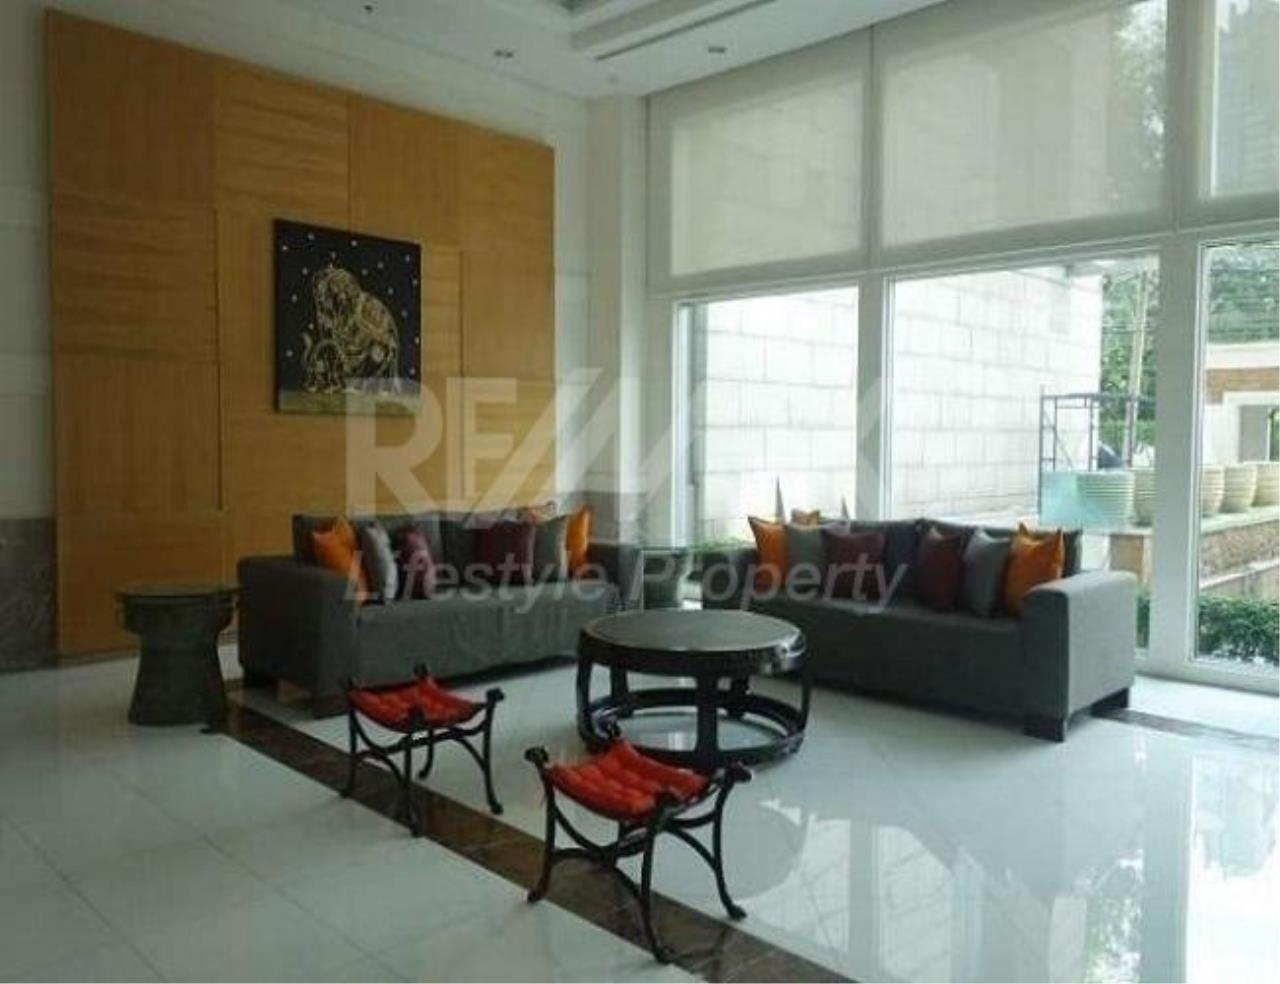 Condominium for rent at royal residence park patum wan bangkok